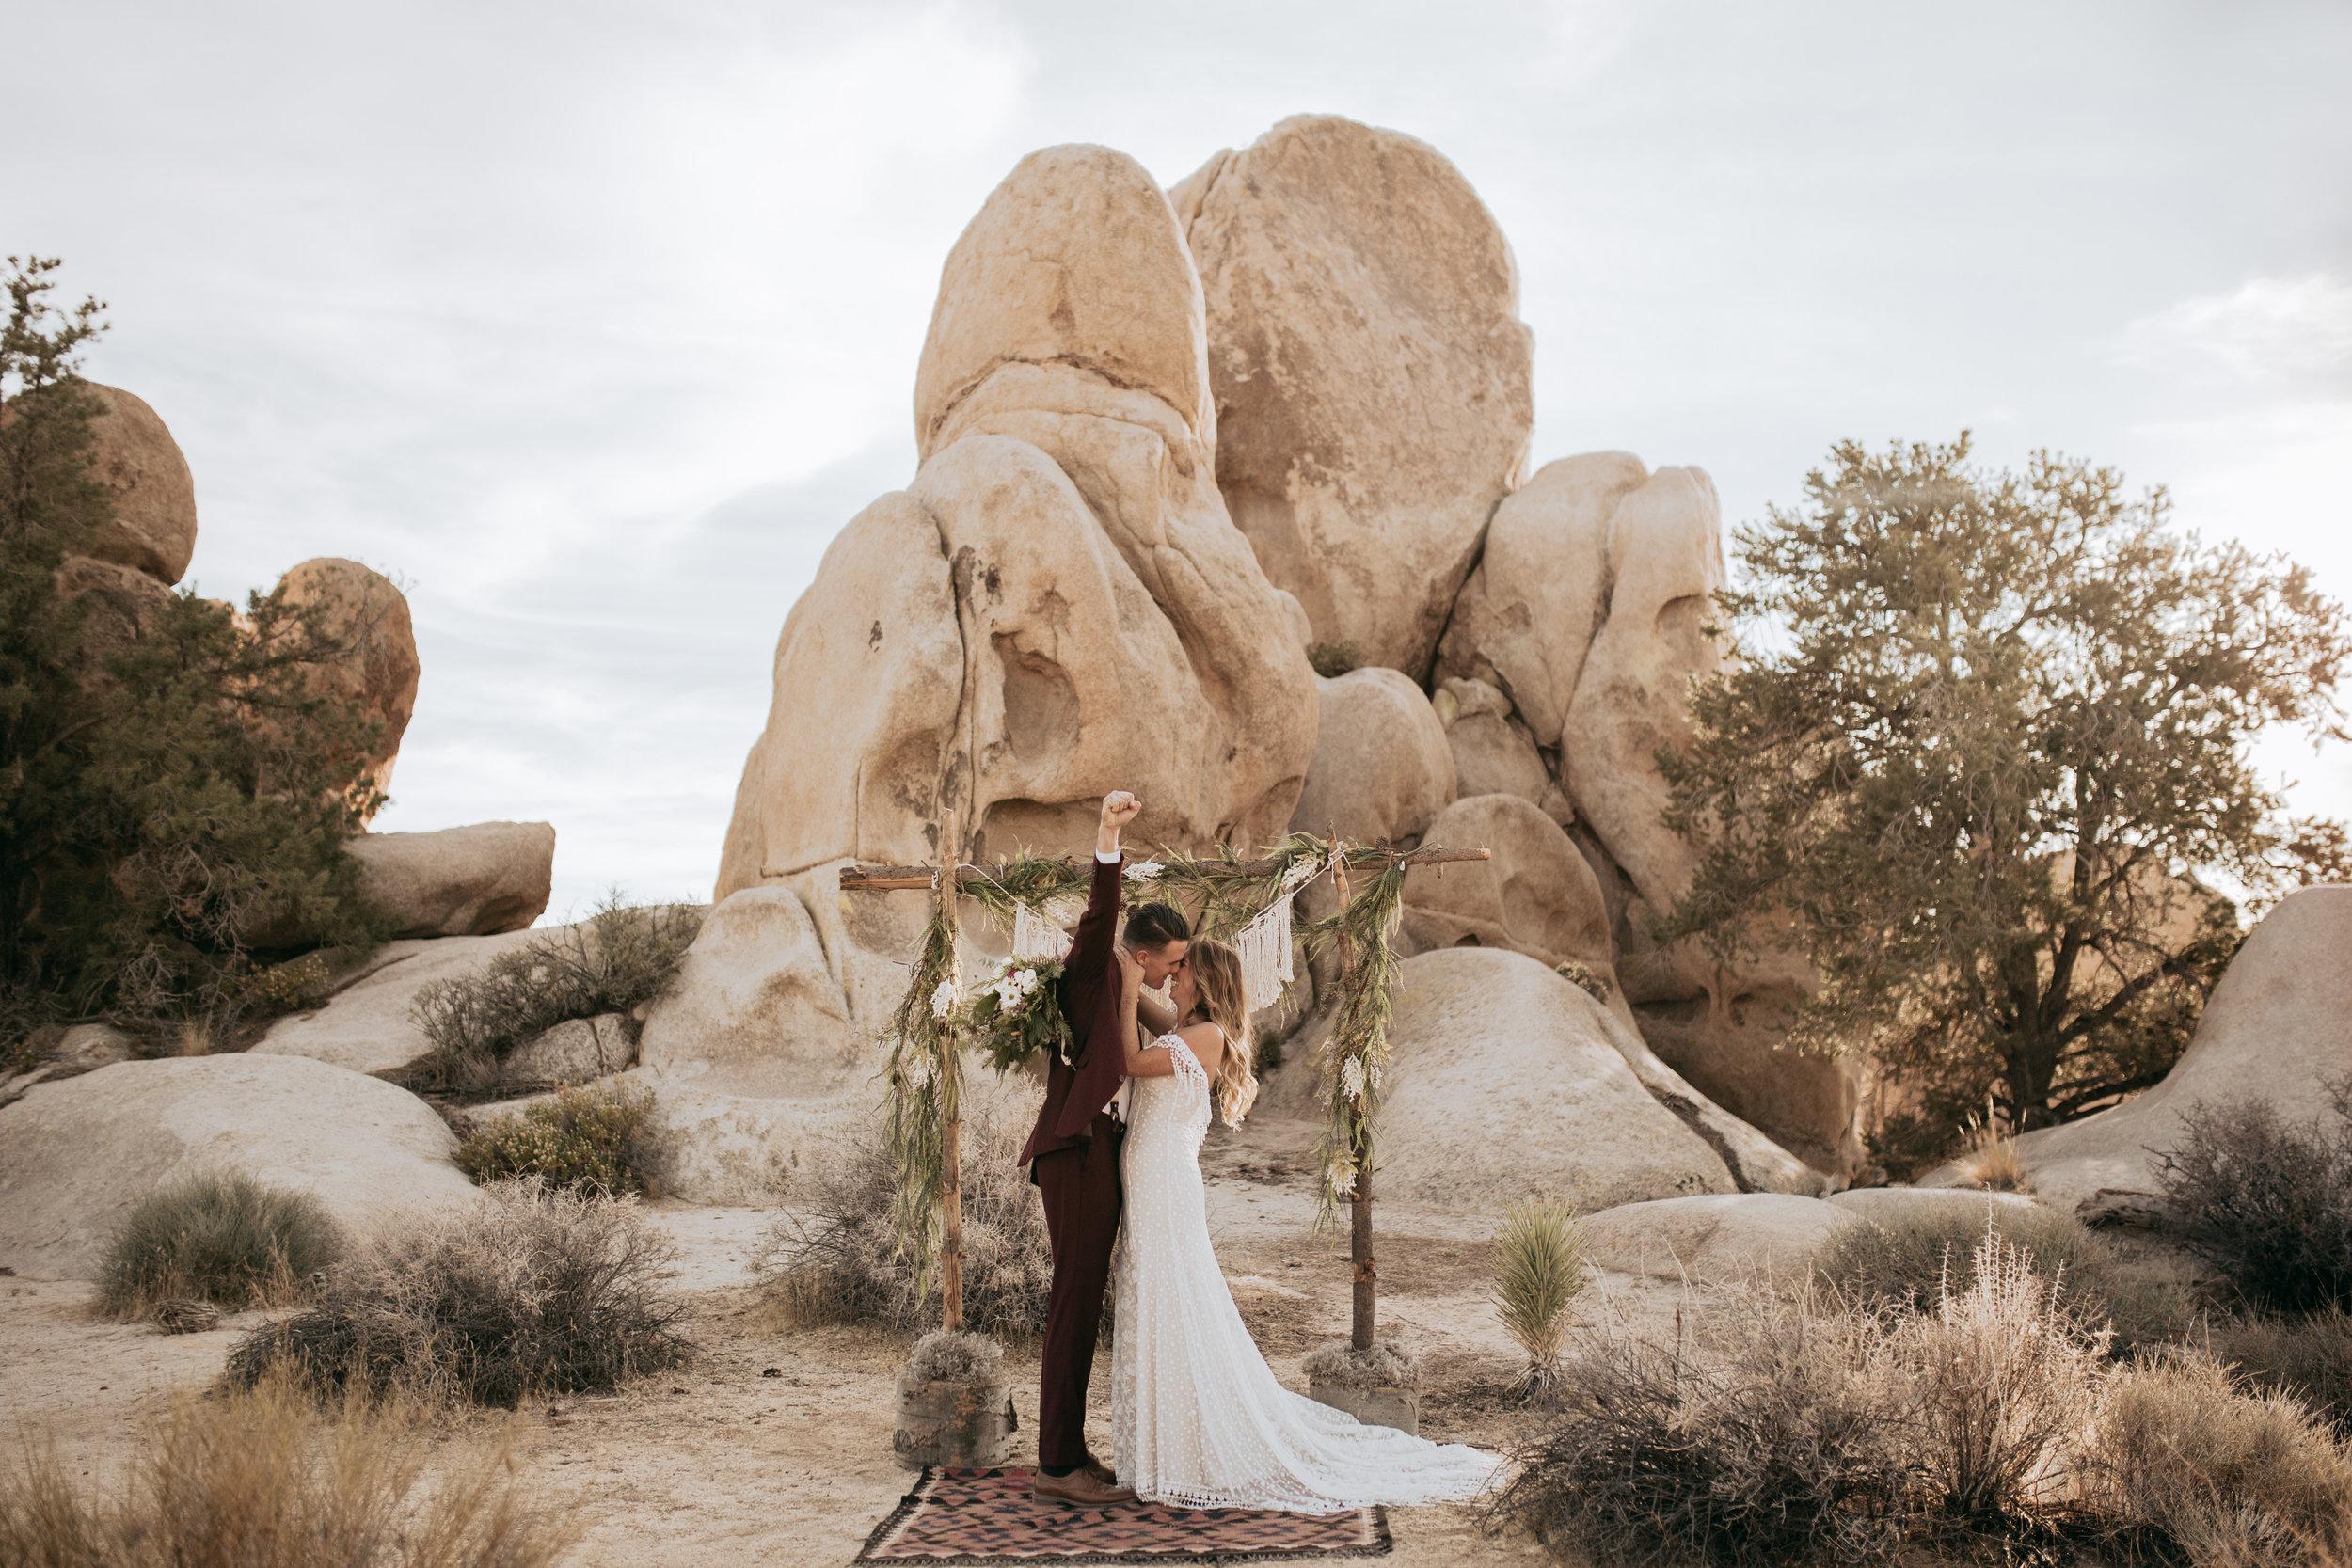 palmsprings_joshuatree_california_wedding_photographer-14.jpg